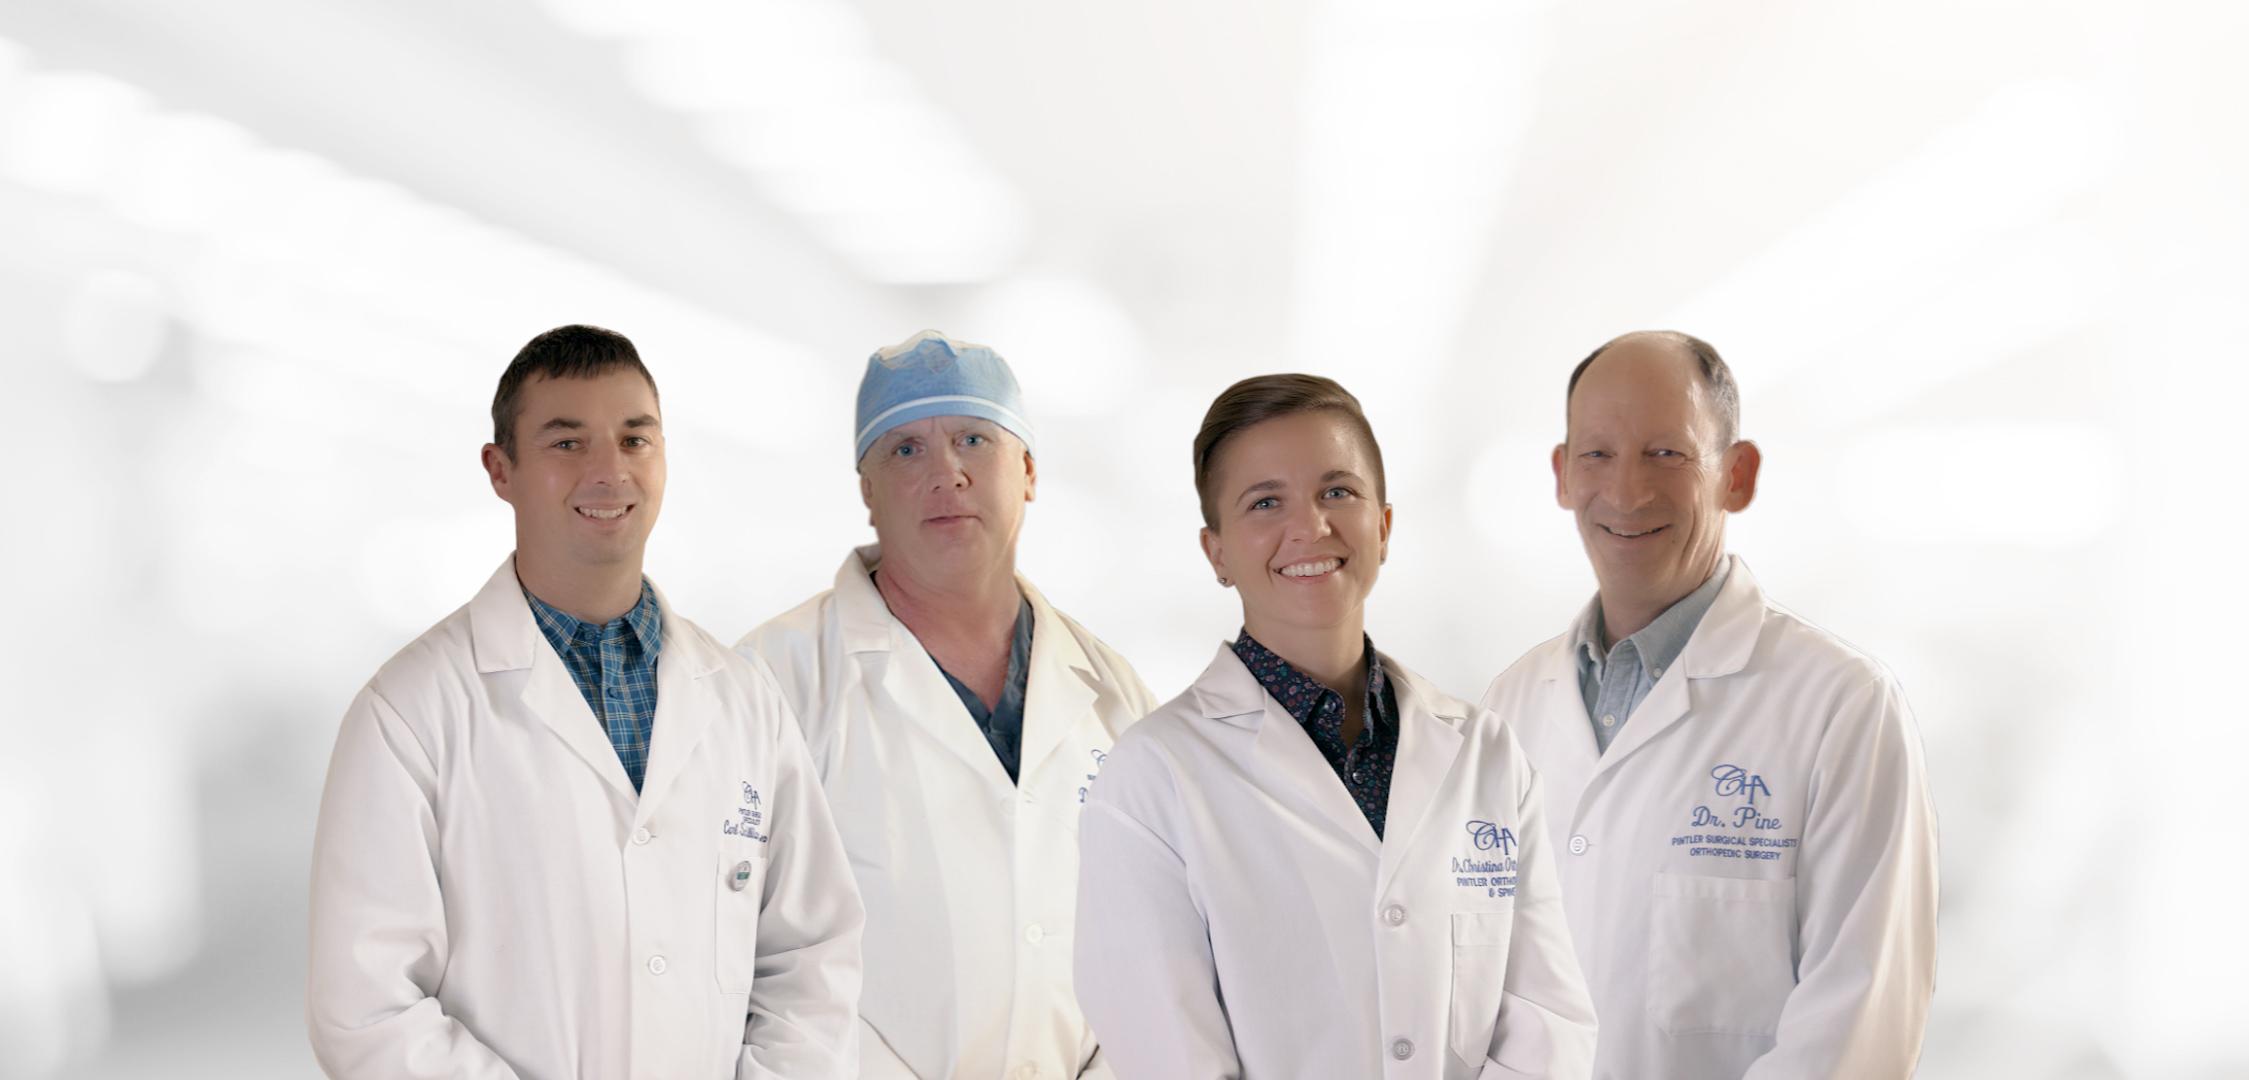 pintler orthopedics and spine doctors